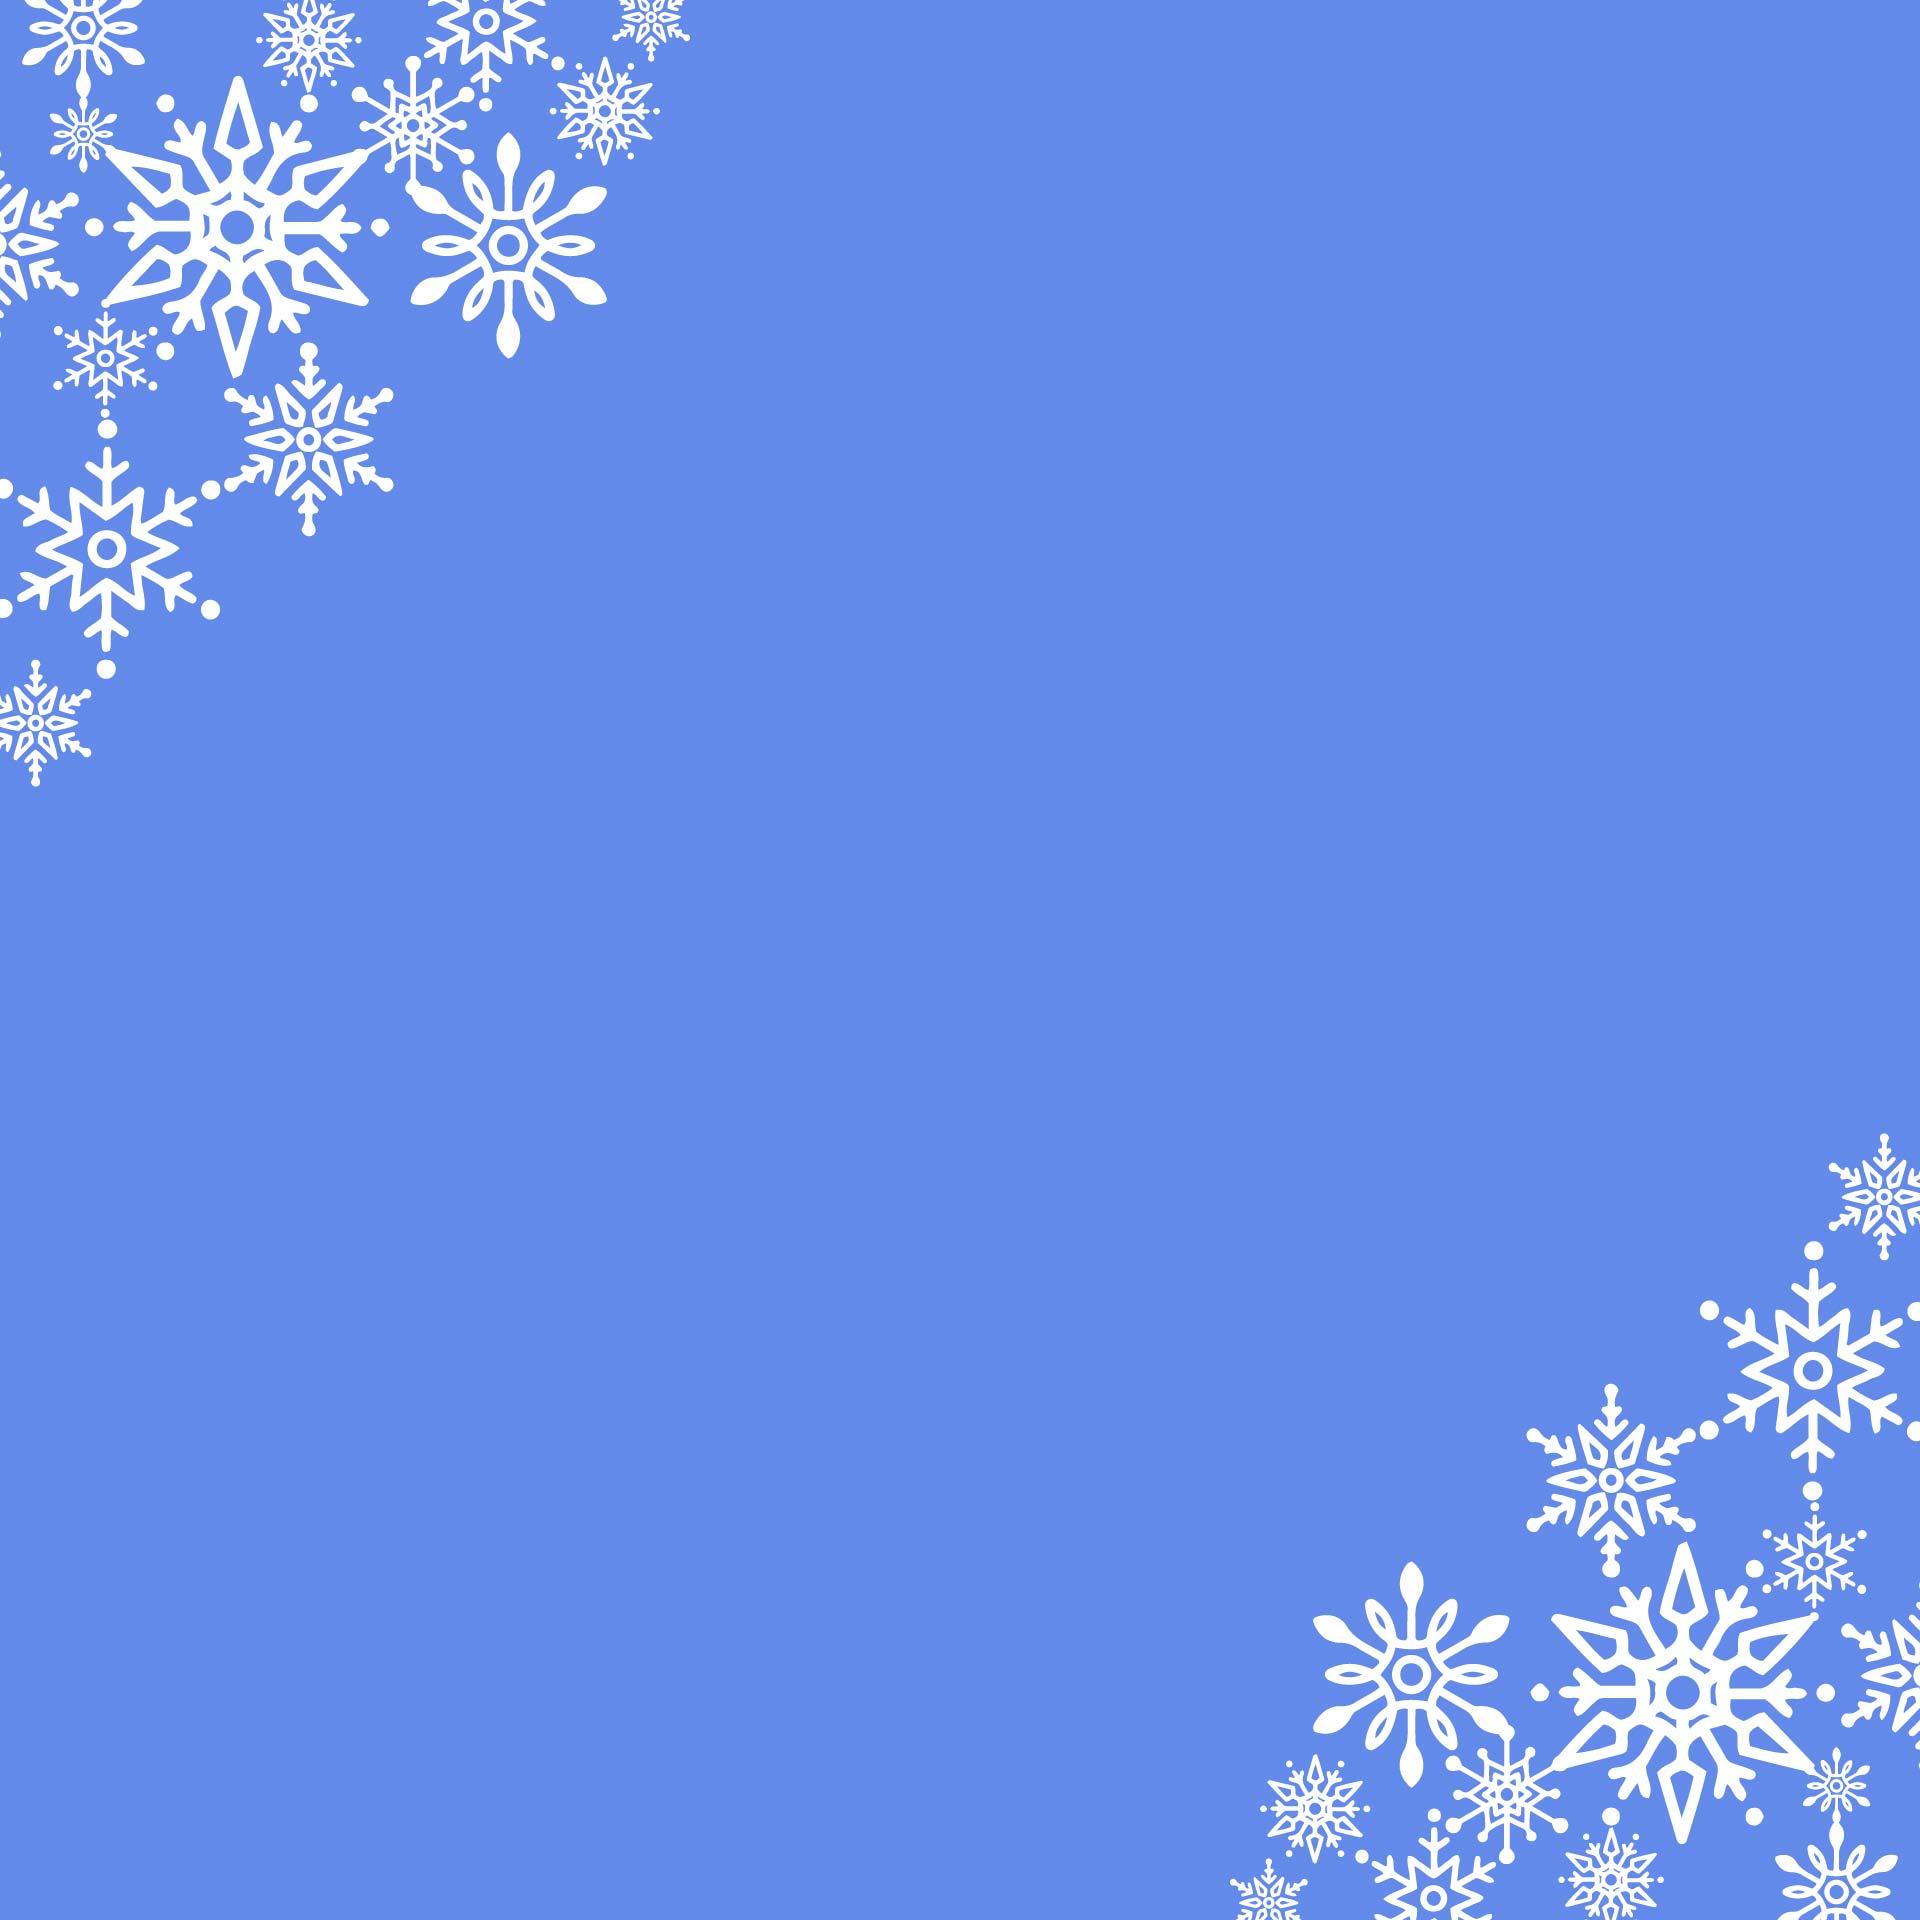 Best Images of Free Printable Snowflake Borders - Snowflake Border ...